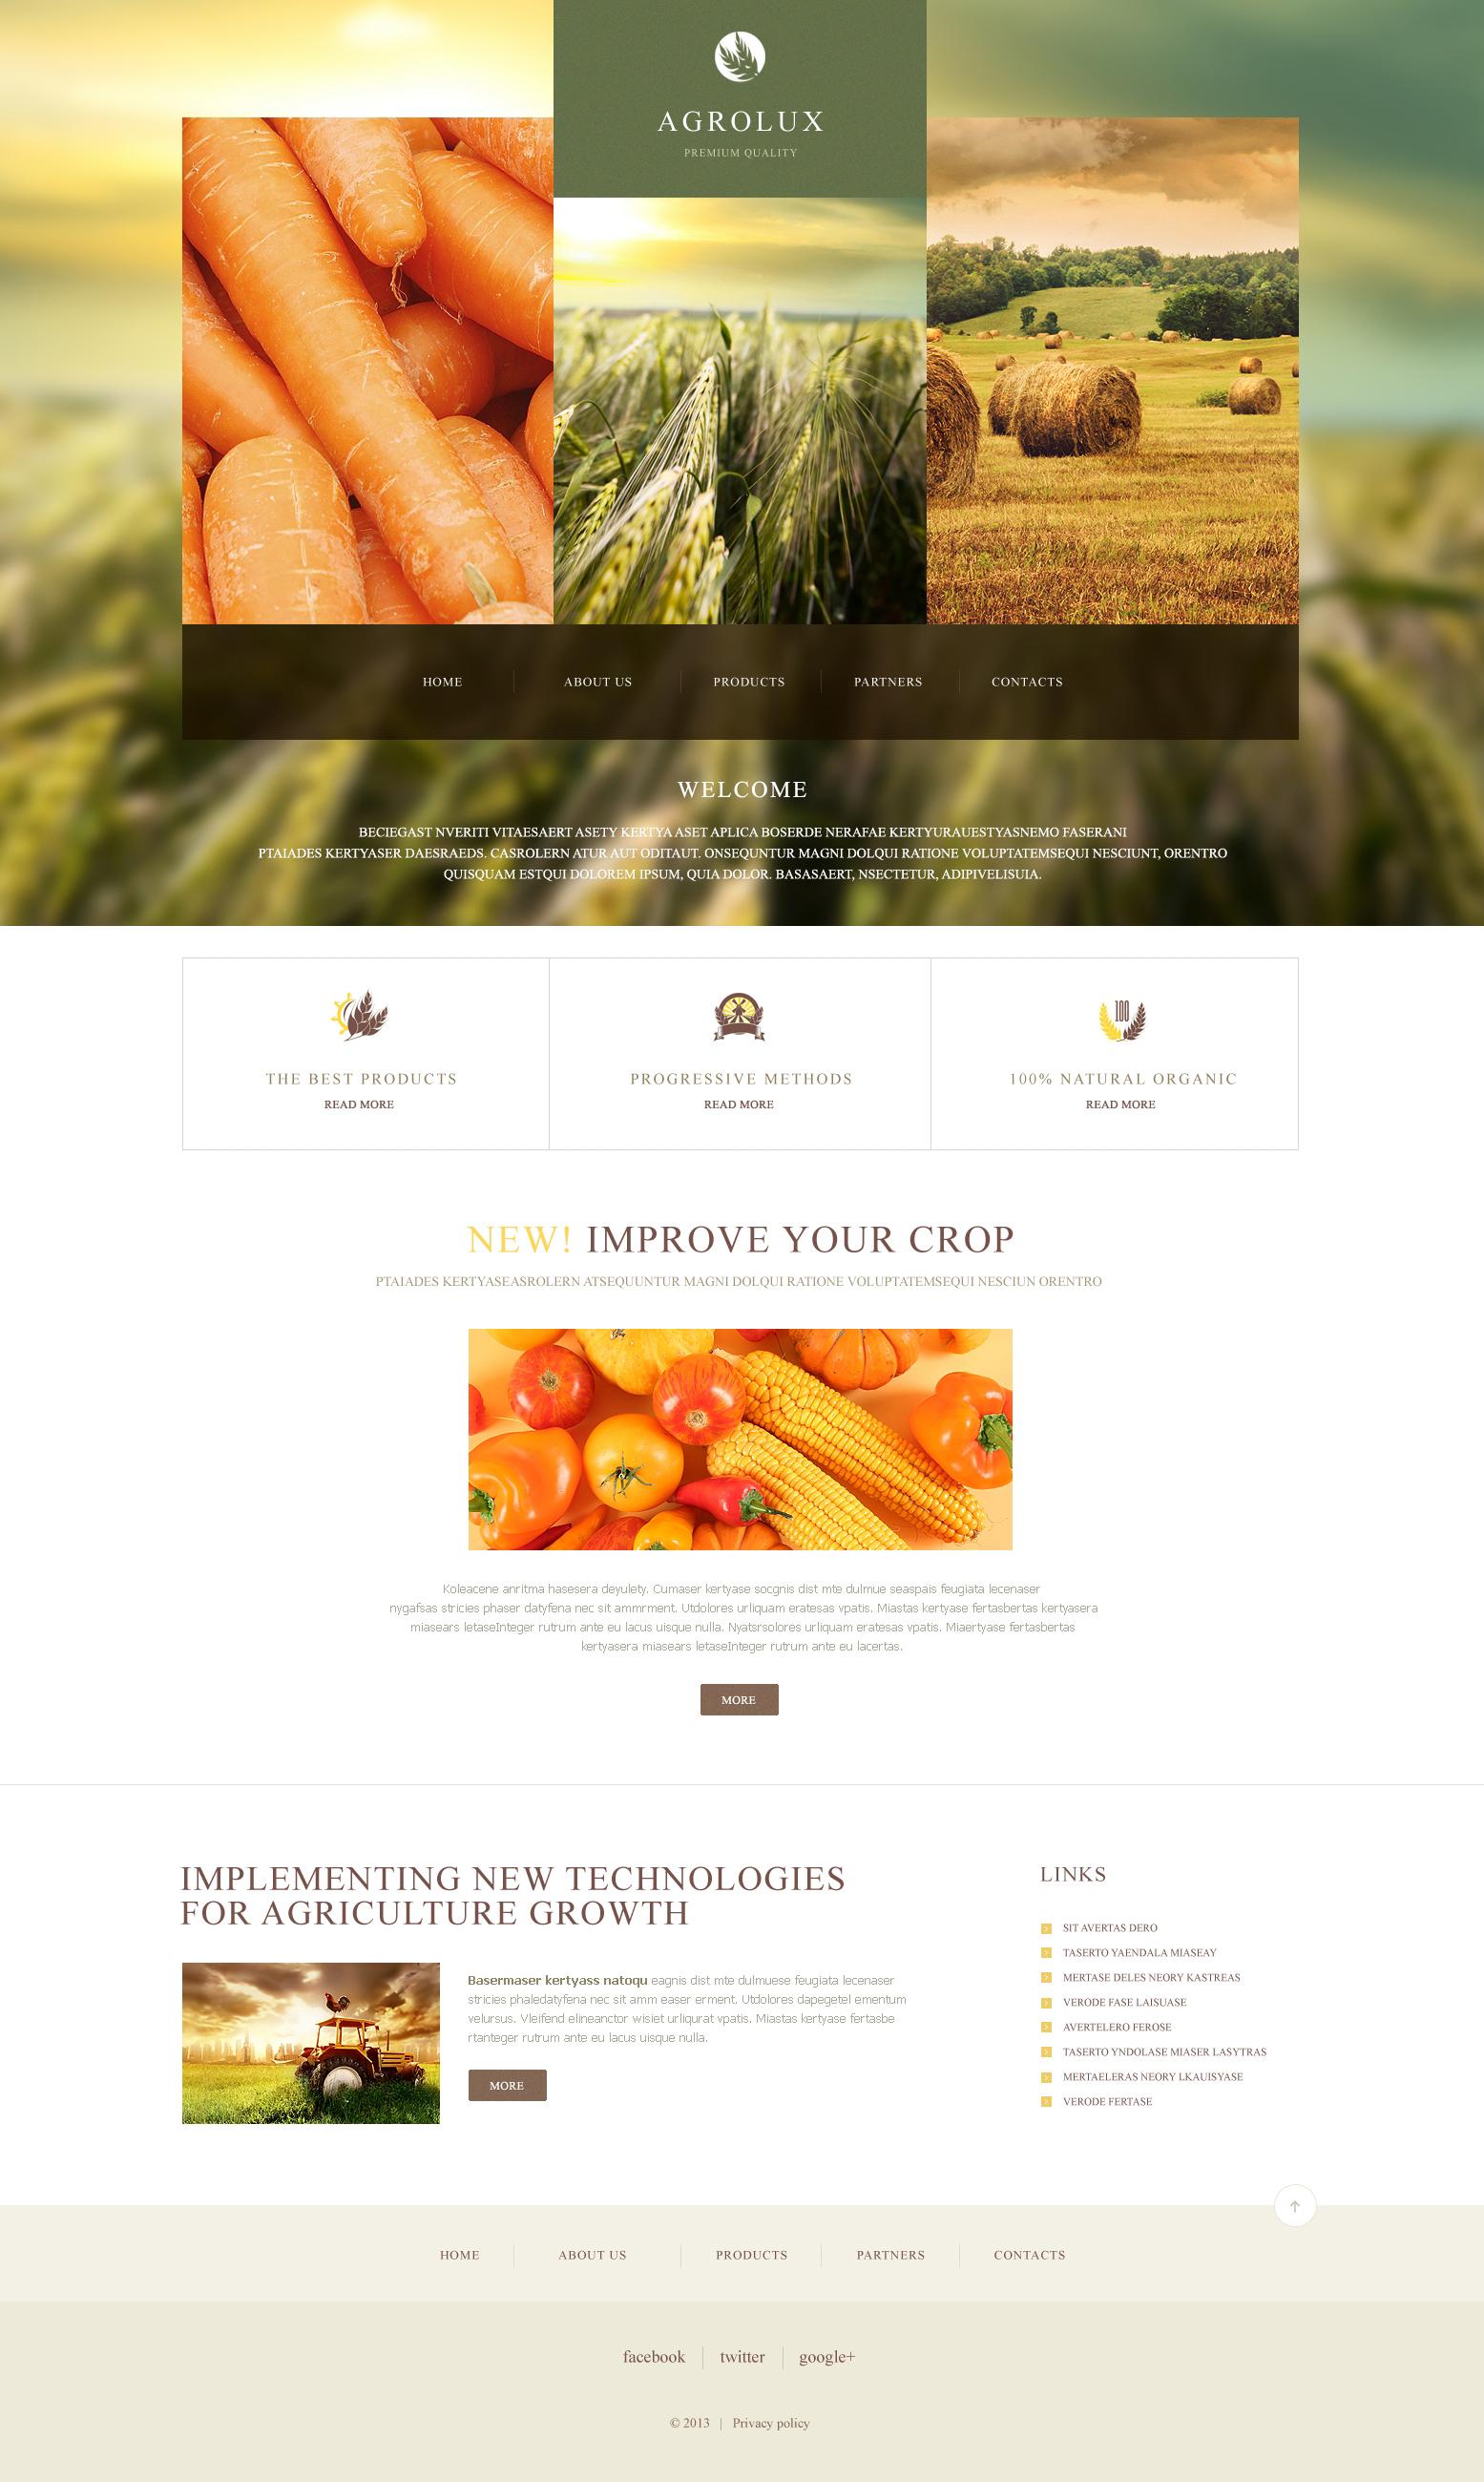 Plantilla Web Responsive para Sitio de Granjas #47428 - captura de pantalla